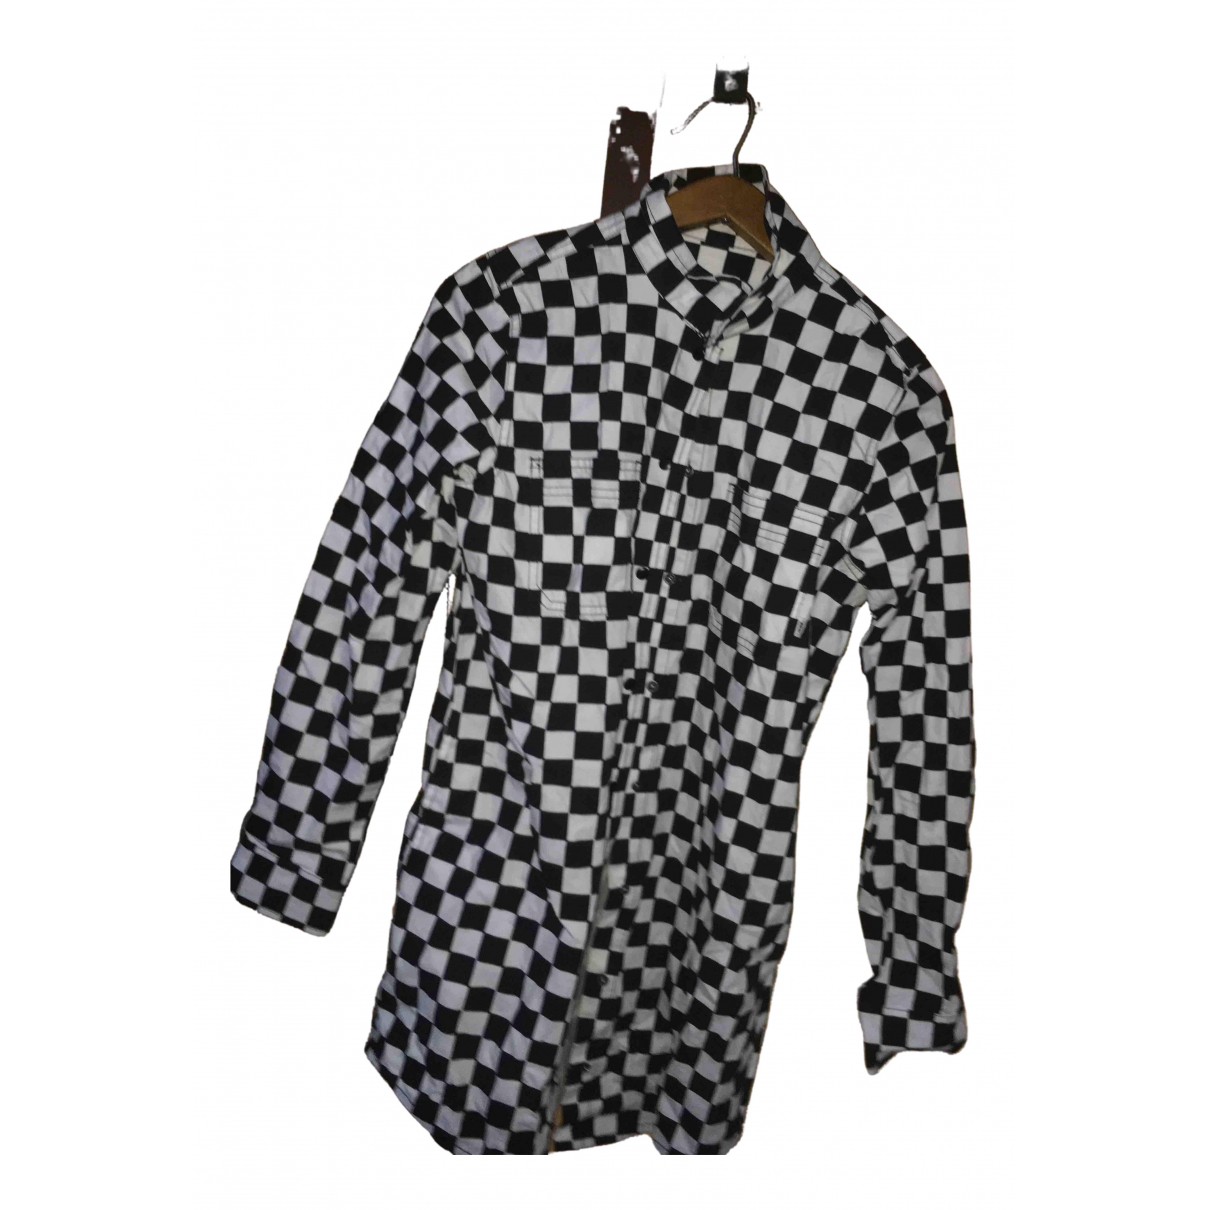 Vans \N Multicolour Cotton dress for Women S International